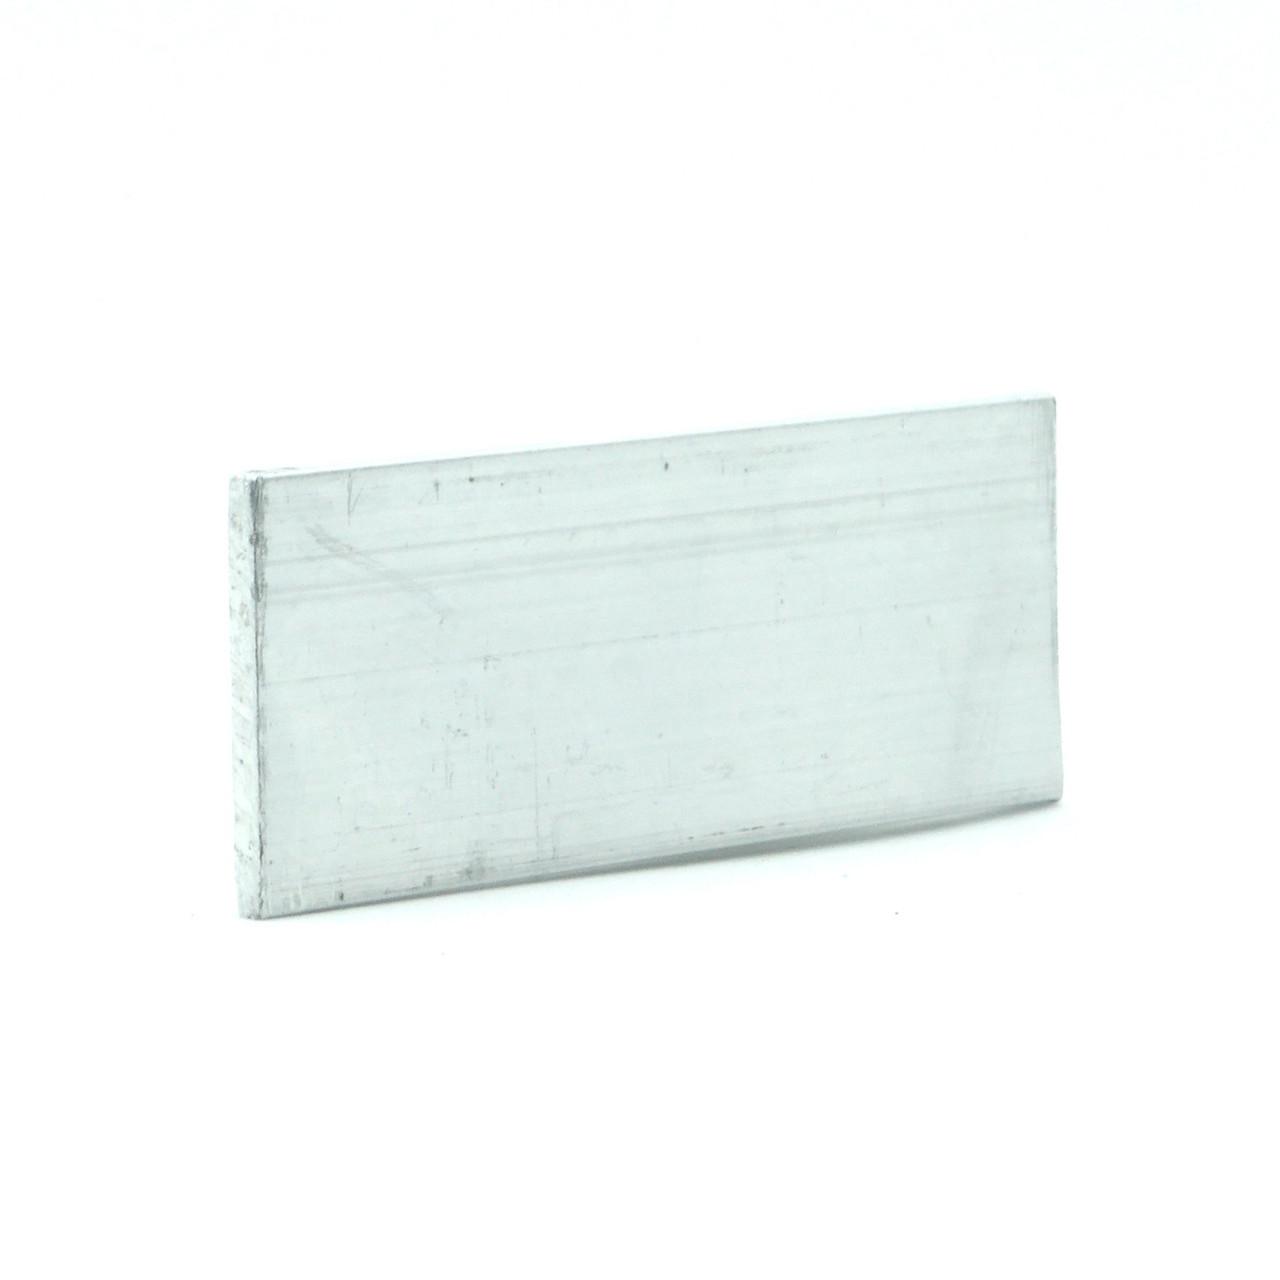 Бандажная лента 2 м., для монтажа натяжных потолков